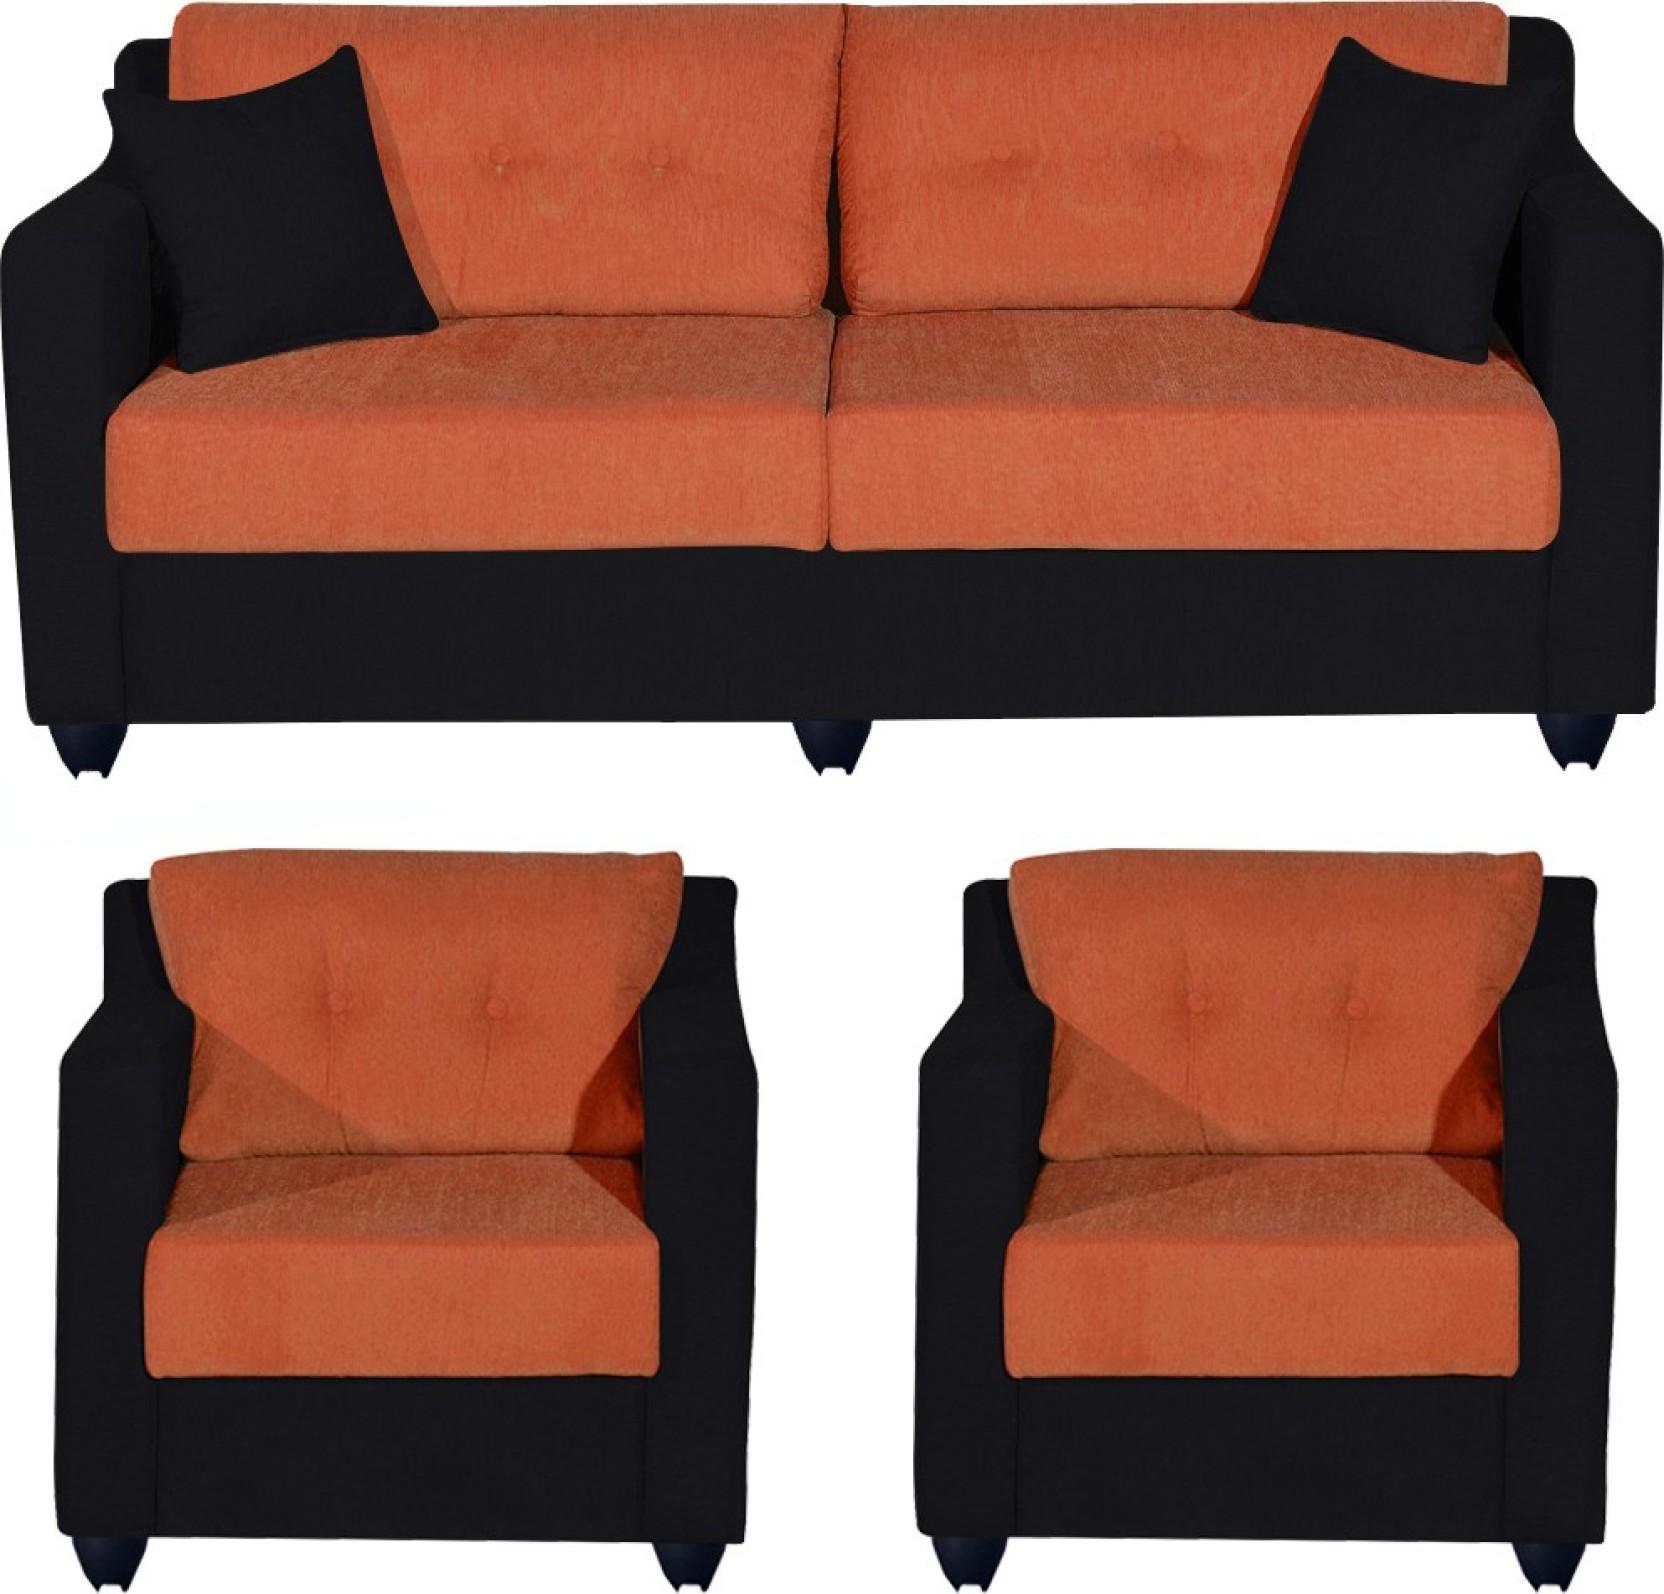 Bharat Lifestyle Lisbon Fabric 3 1 1 Orange Black Sofa Set Price